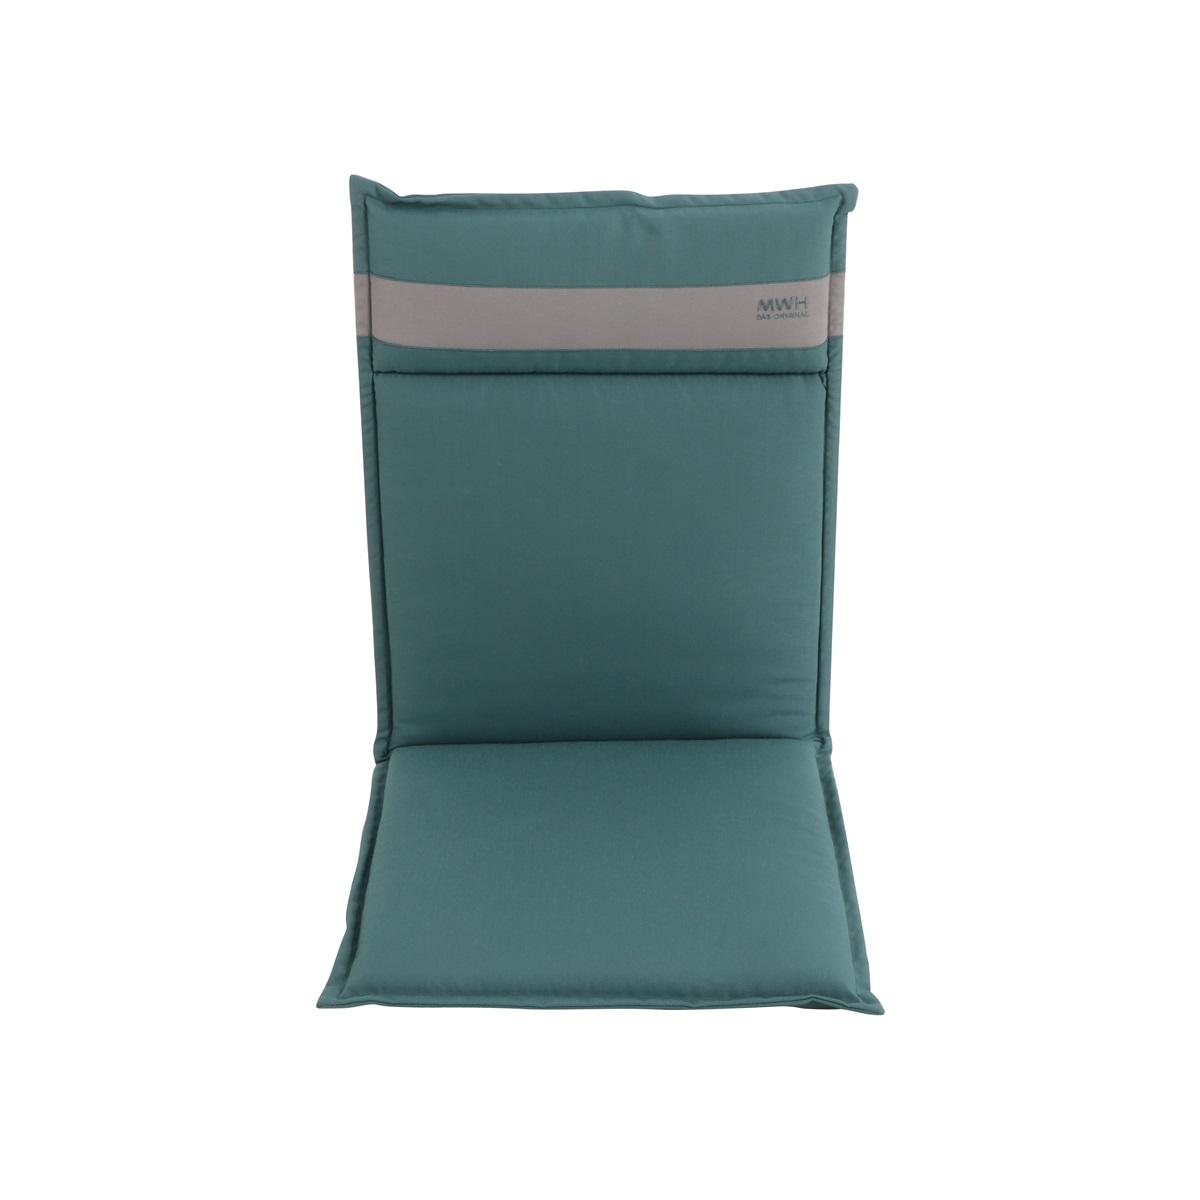 Polstr MWH Premium 110 x 50 cm